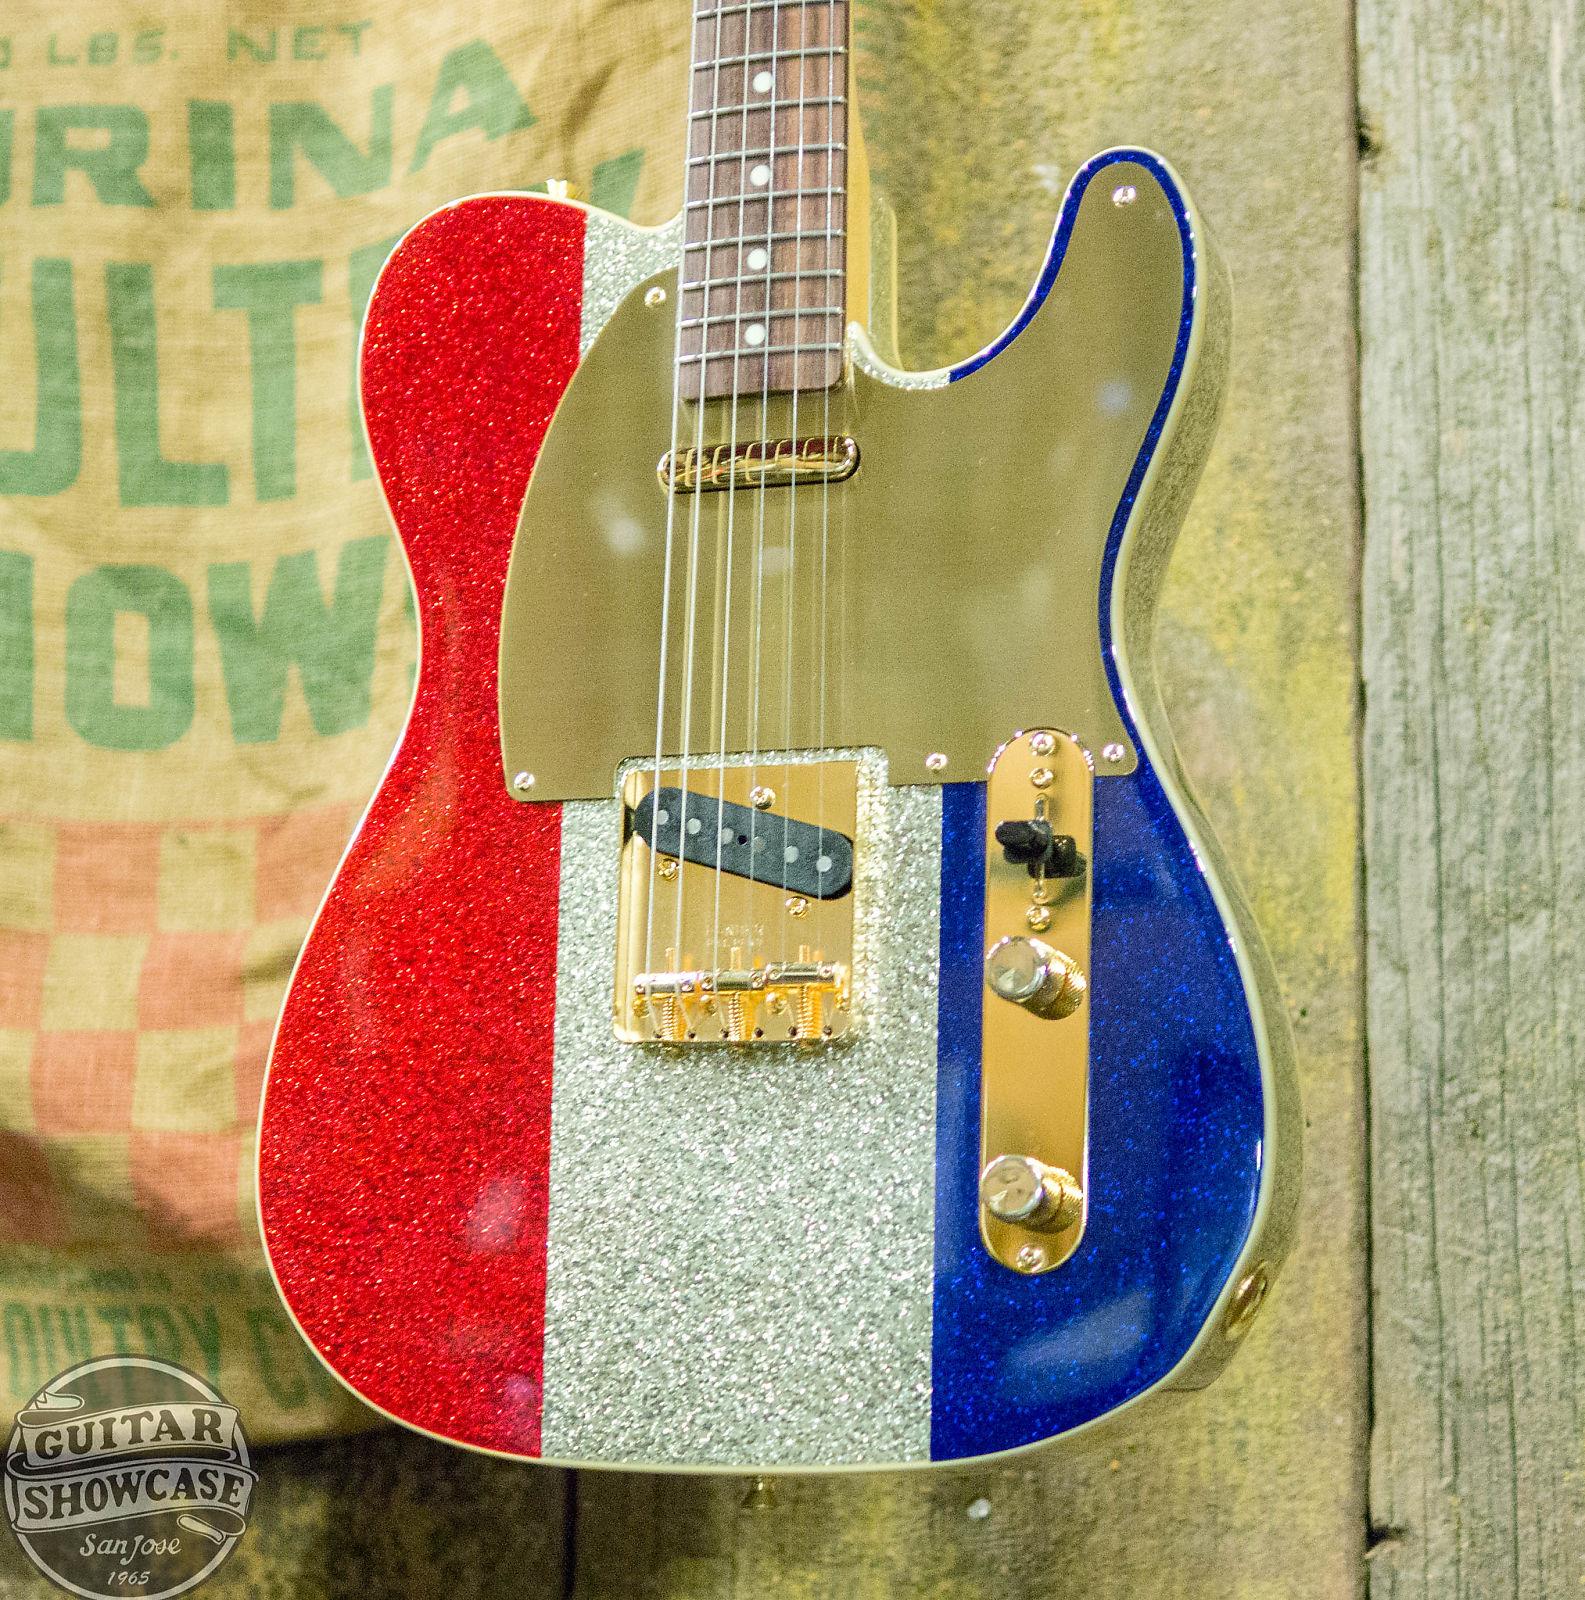 Fender Buck Owens Signature Telecaster Red, White & Blue